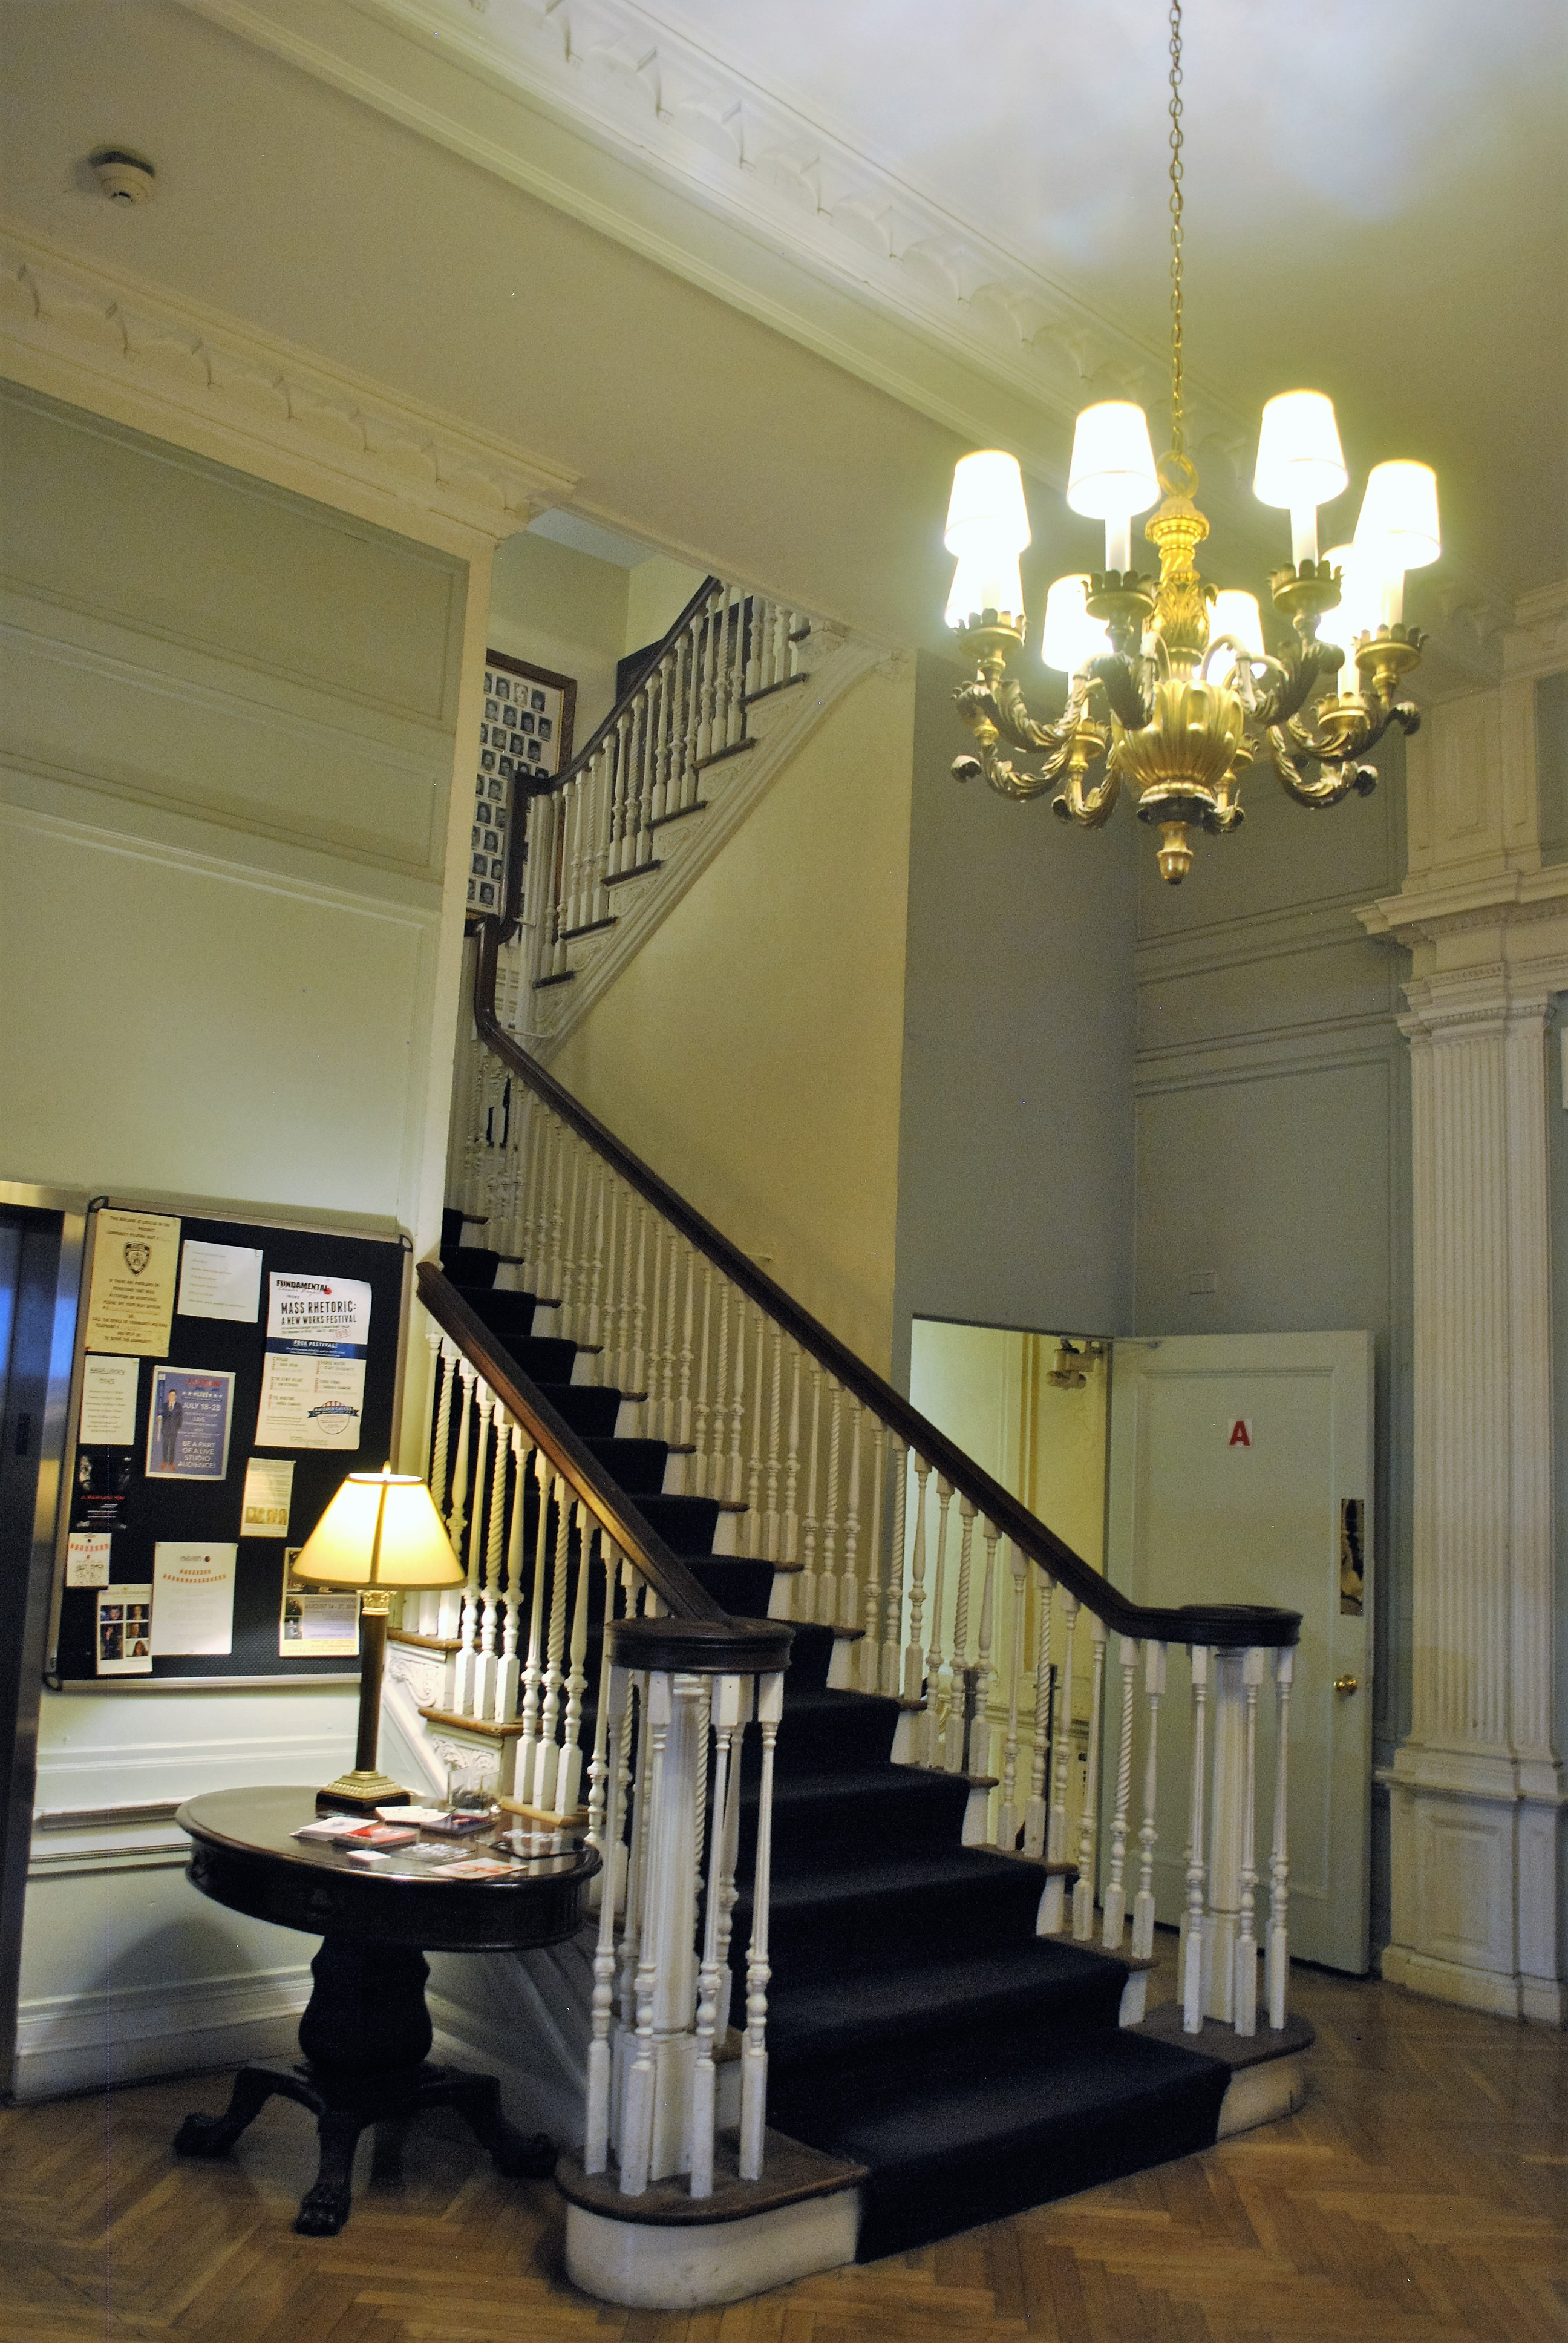 File:First Colony Club House, New York City, NY.jpg